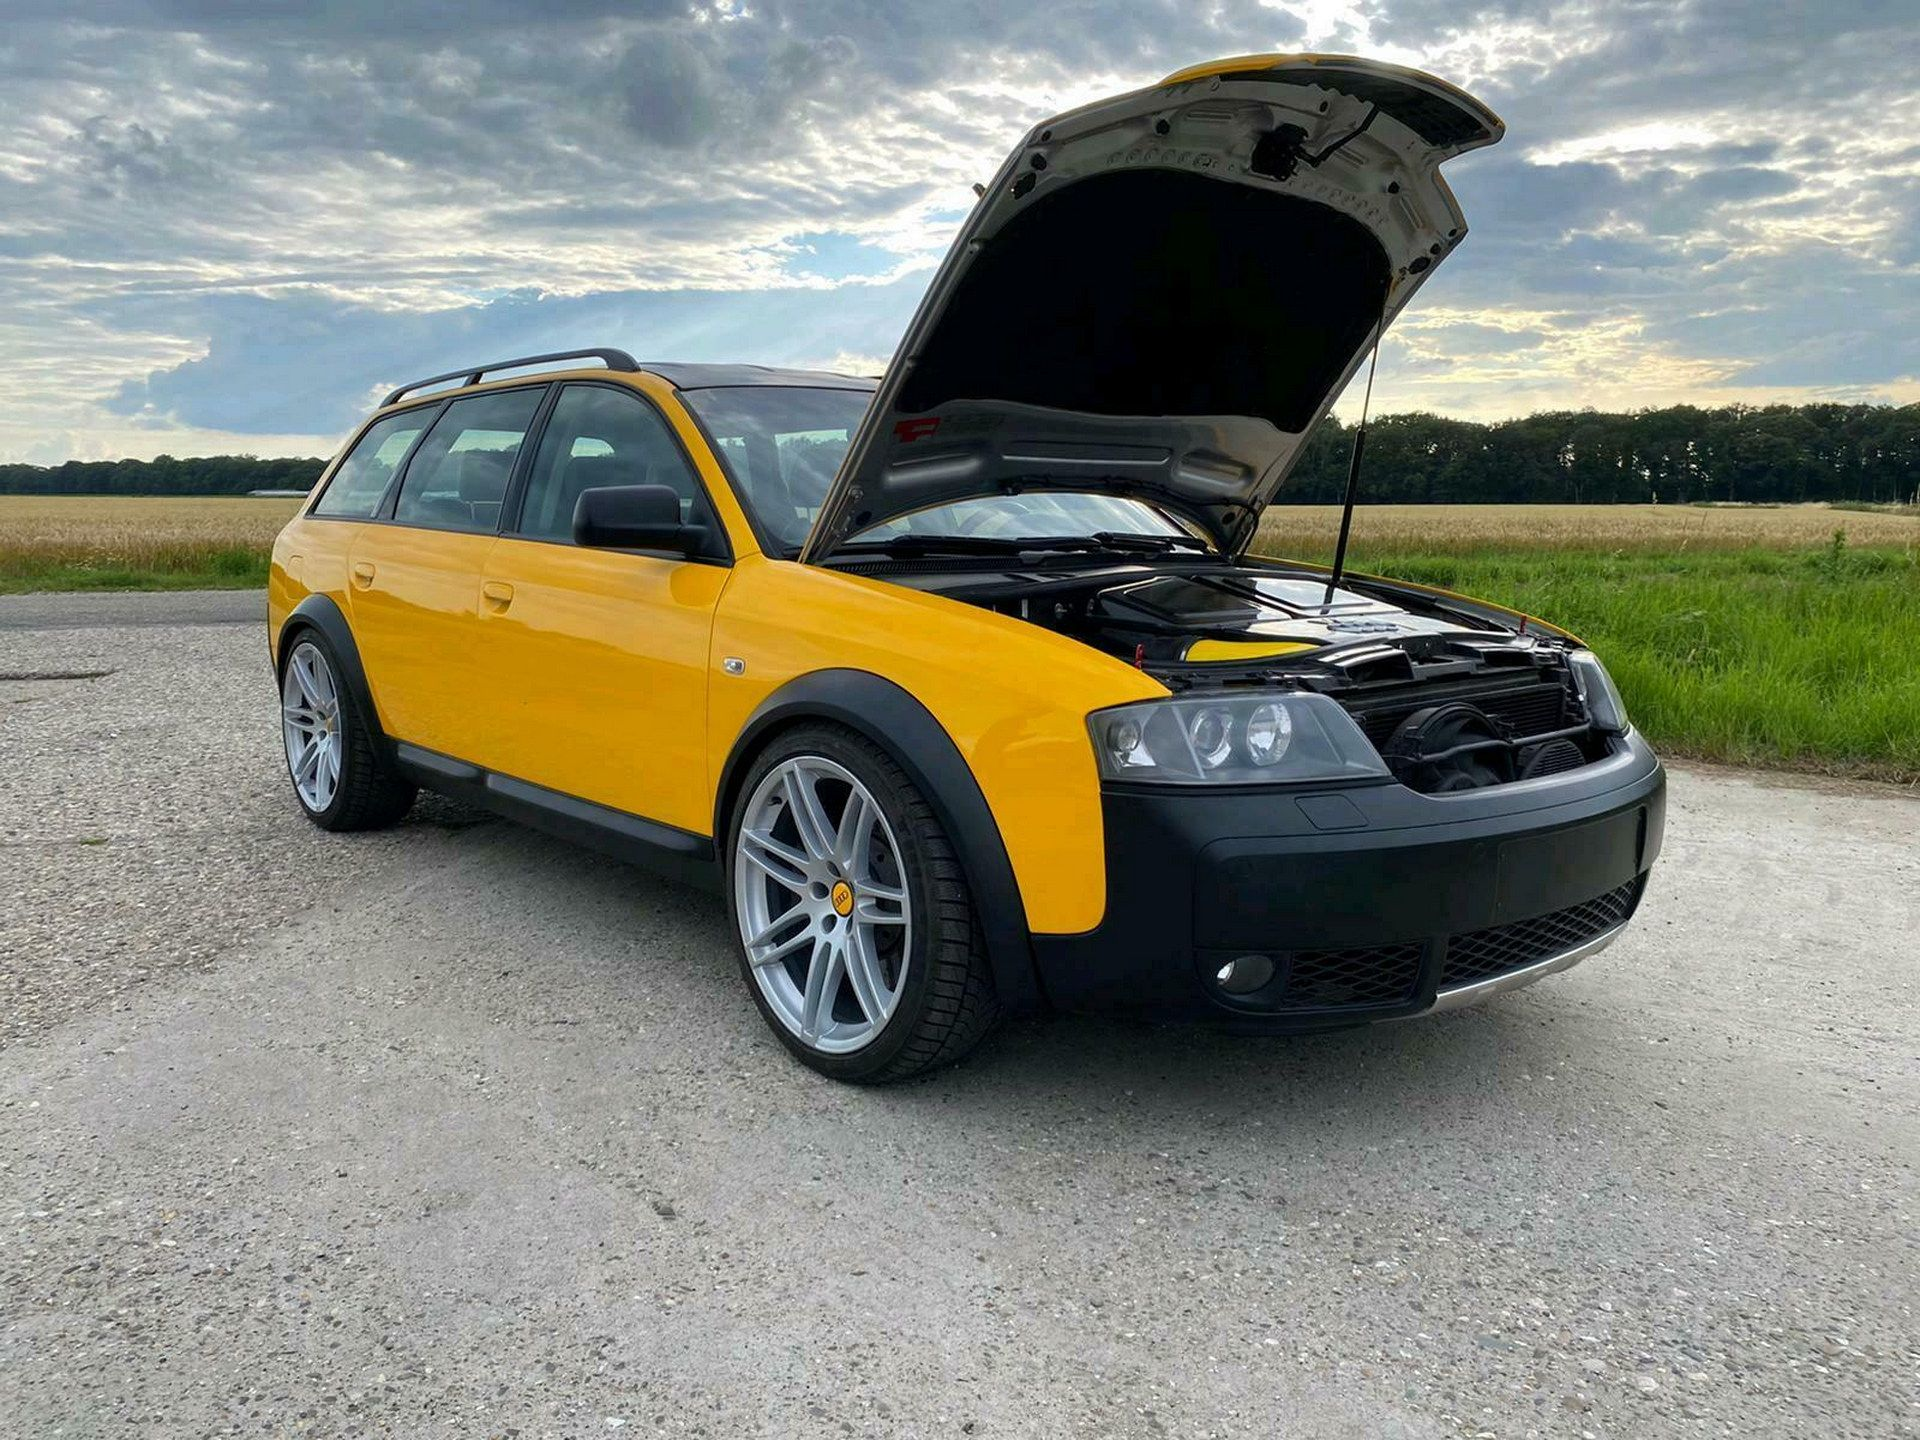 Audi-RS6-Allroad-Custom-Build-7.jpg